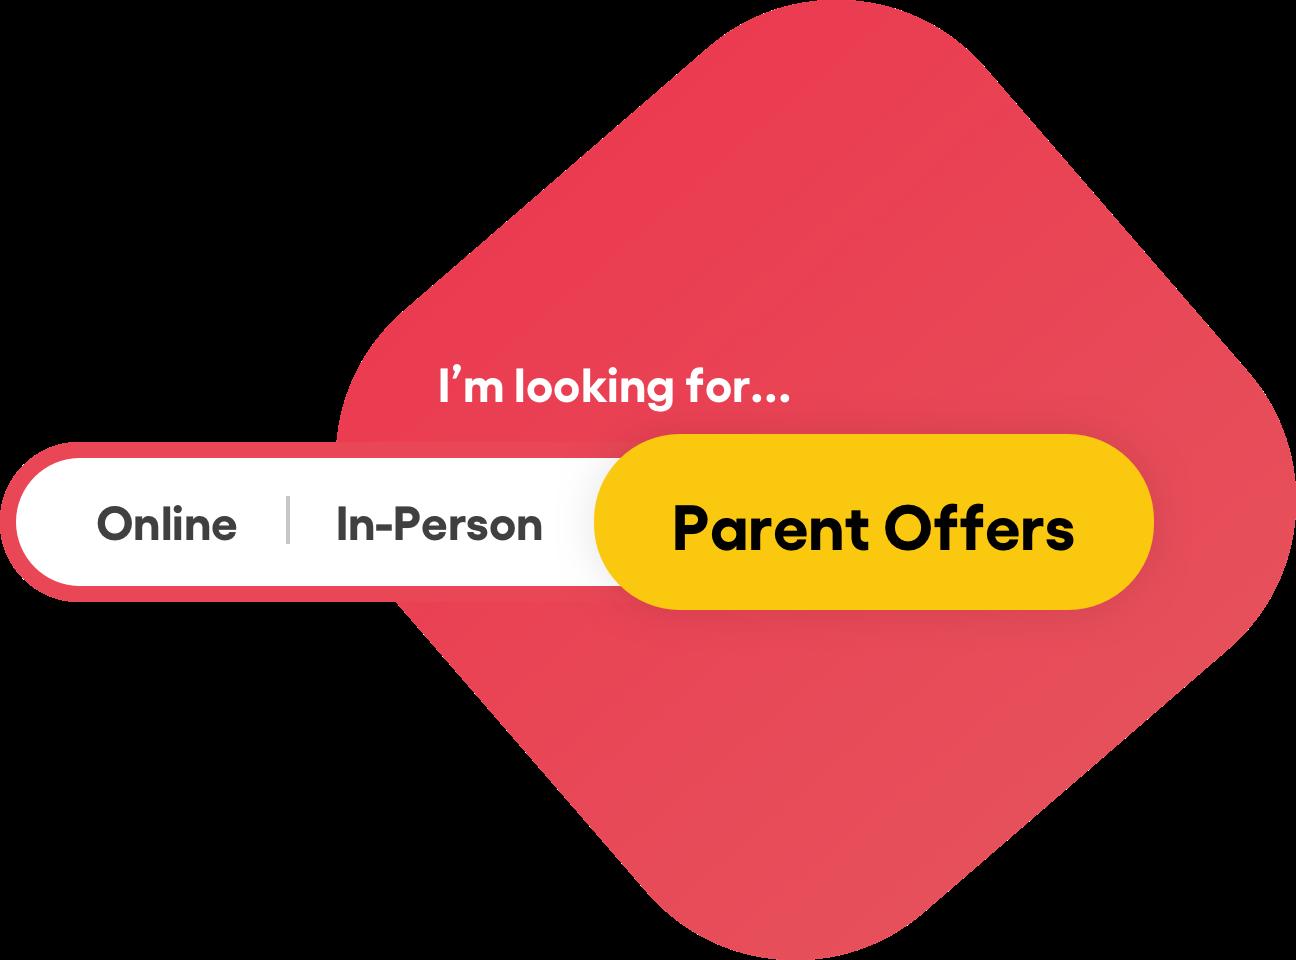 Parent offers image